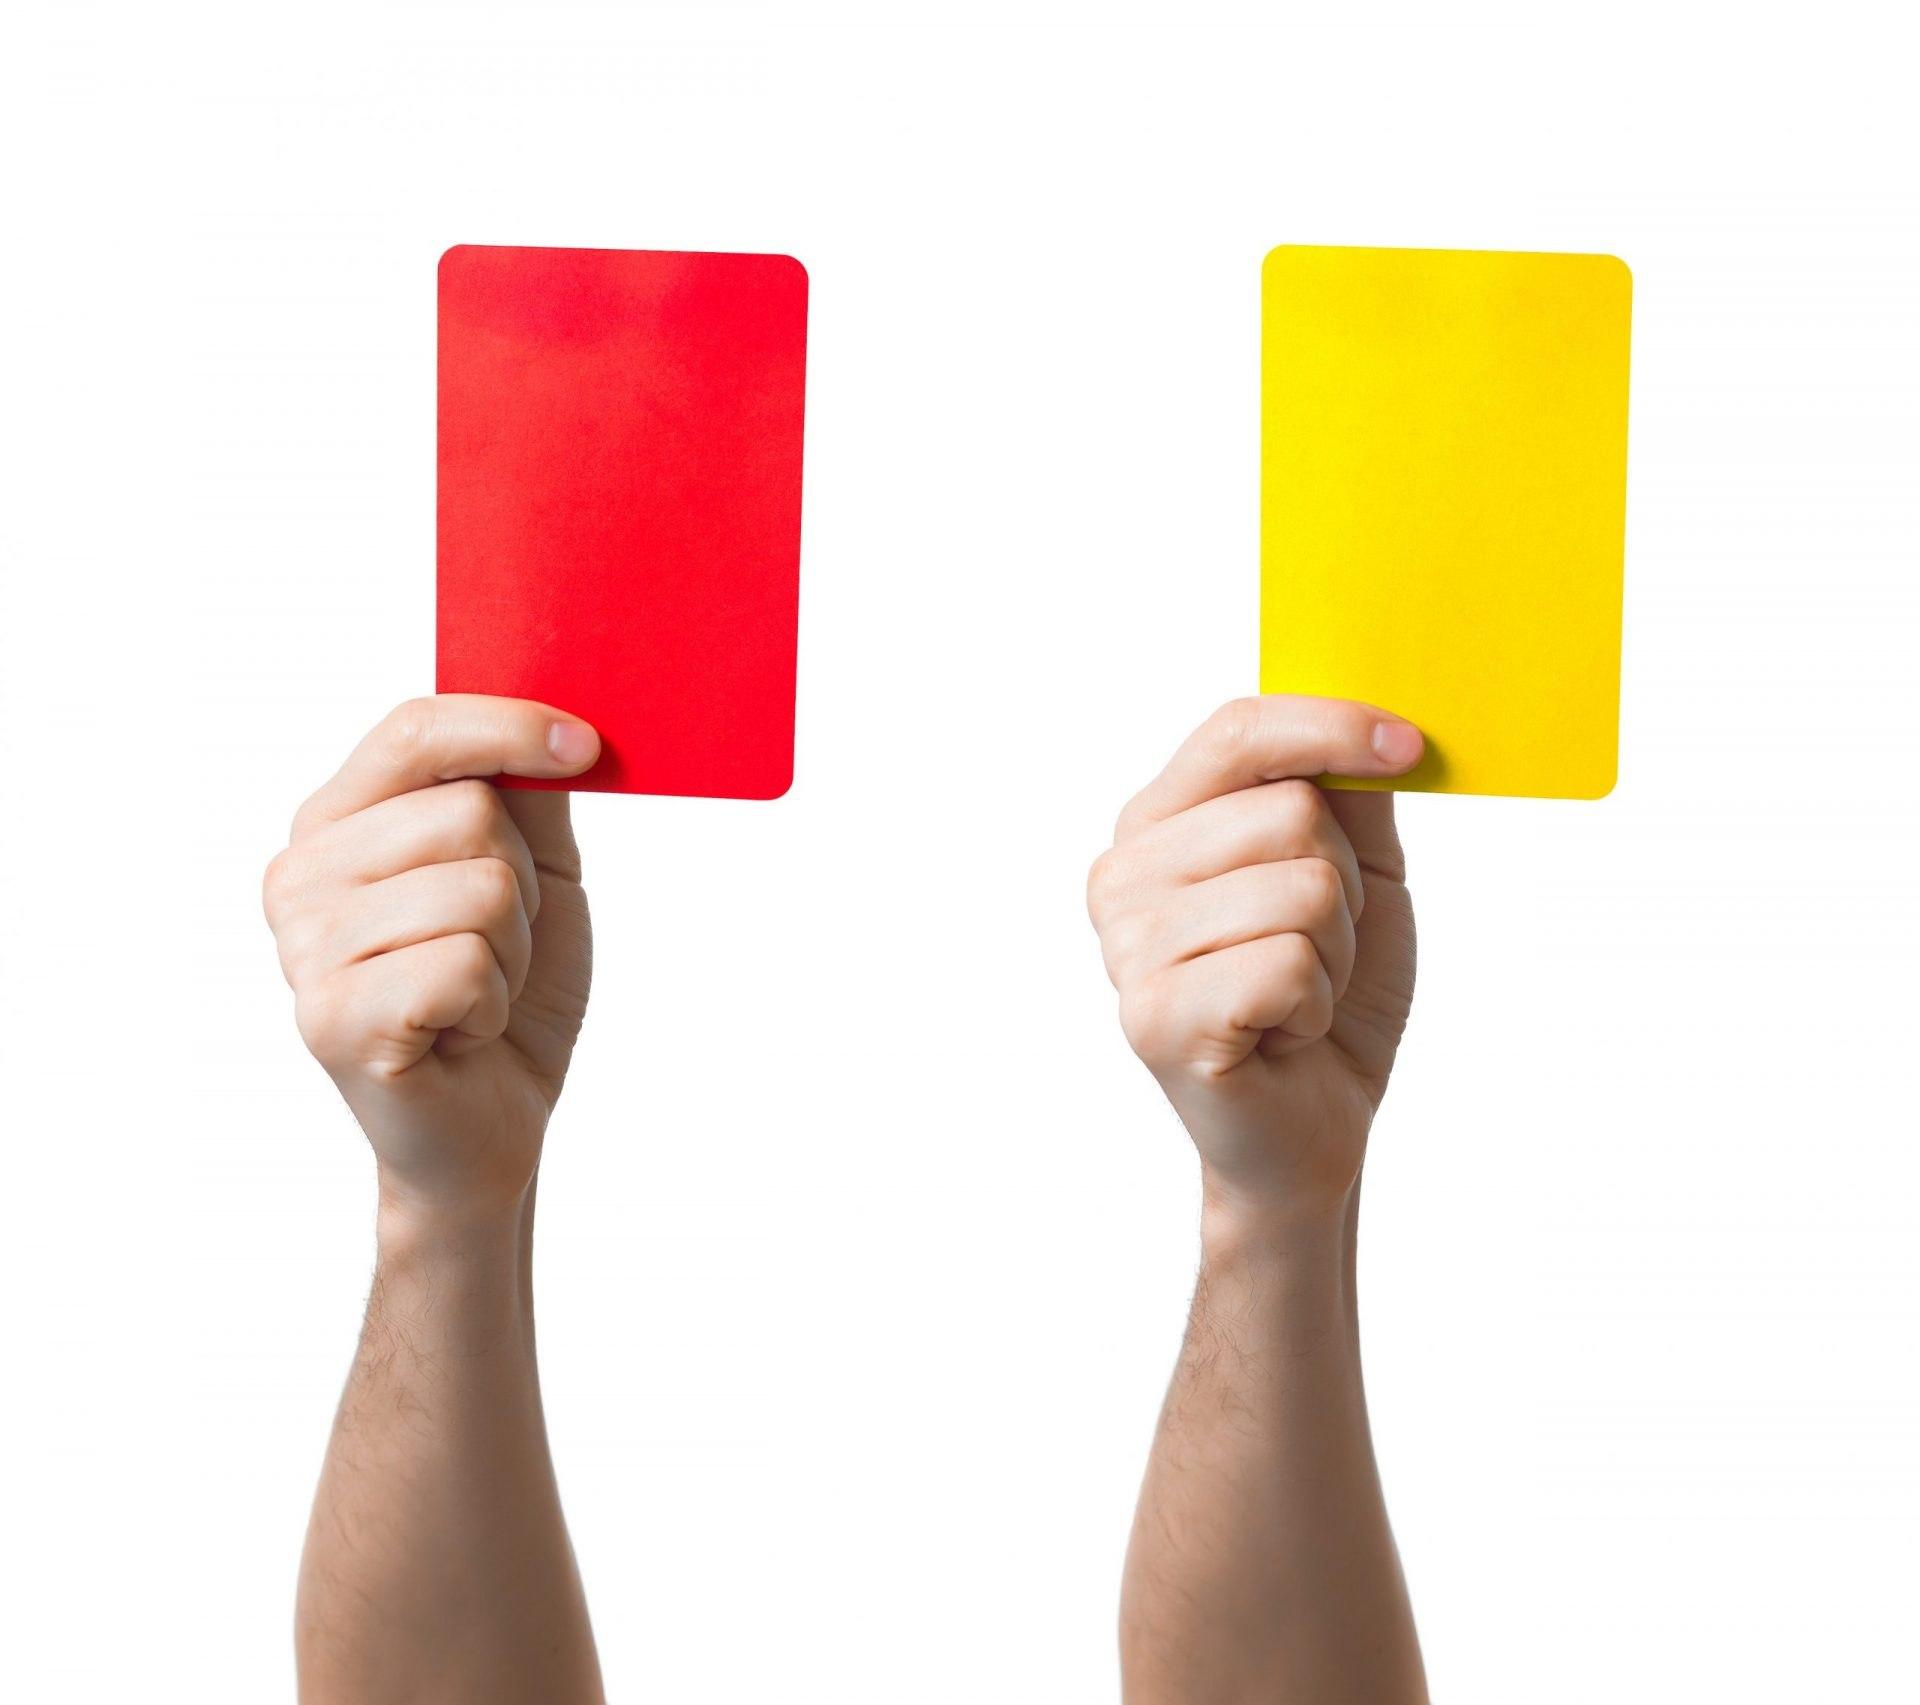 Abmahnung: die gelbe Karte im Arbeitsrecht